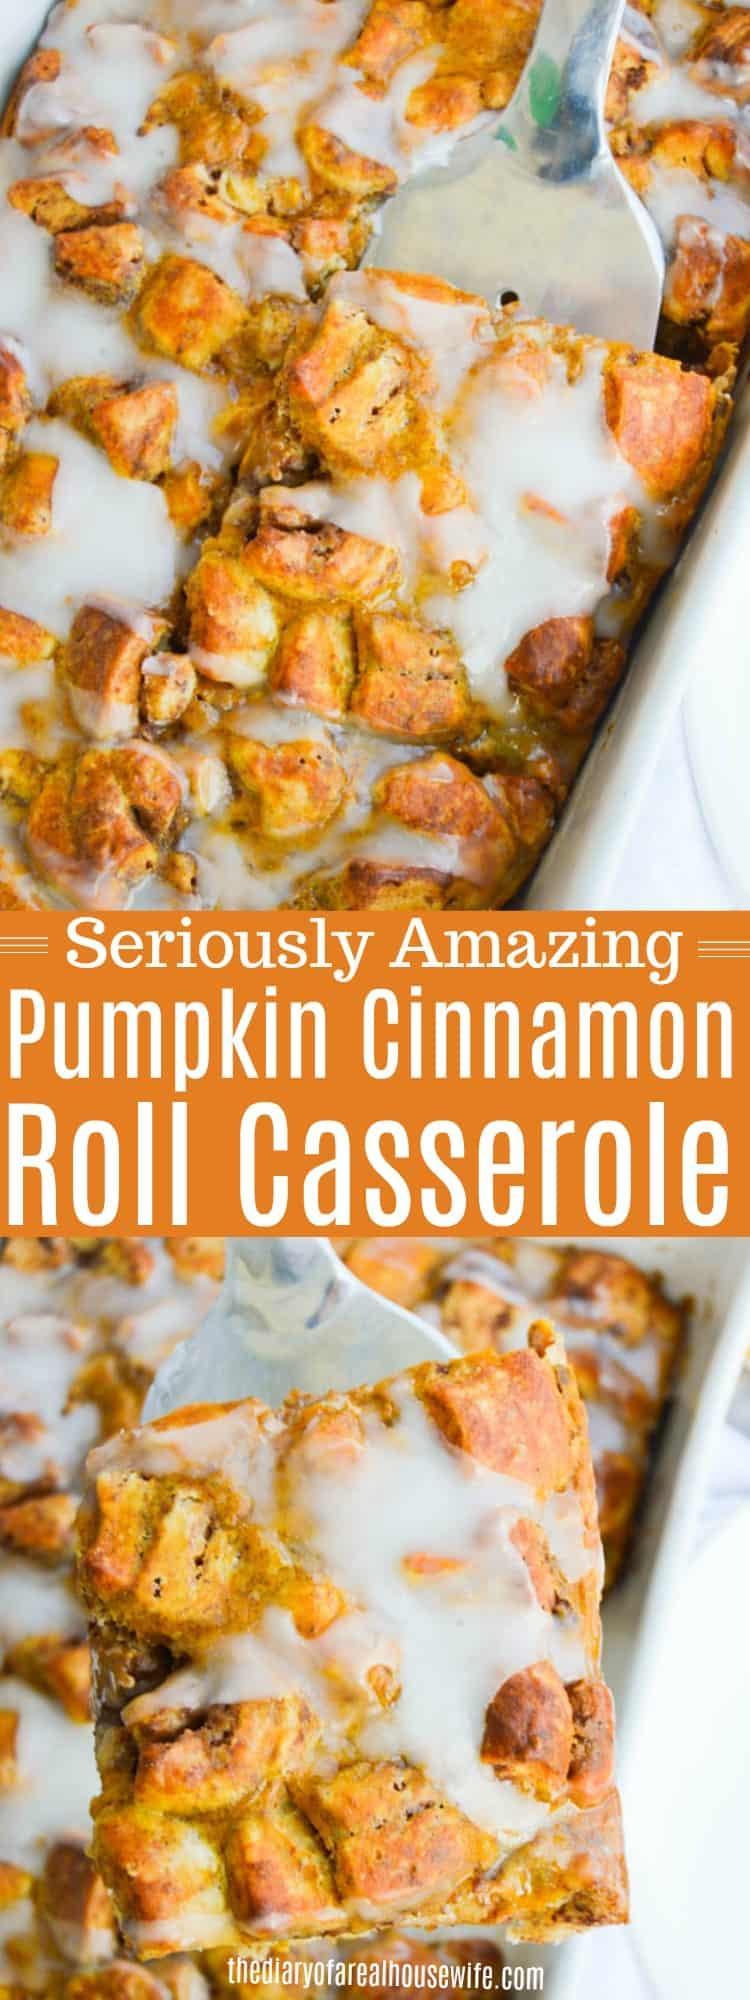 Pumpkin Cinnamon Roll Casserole